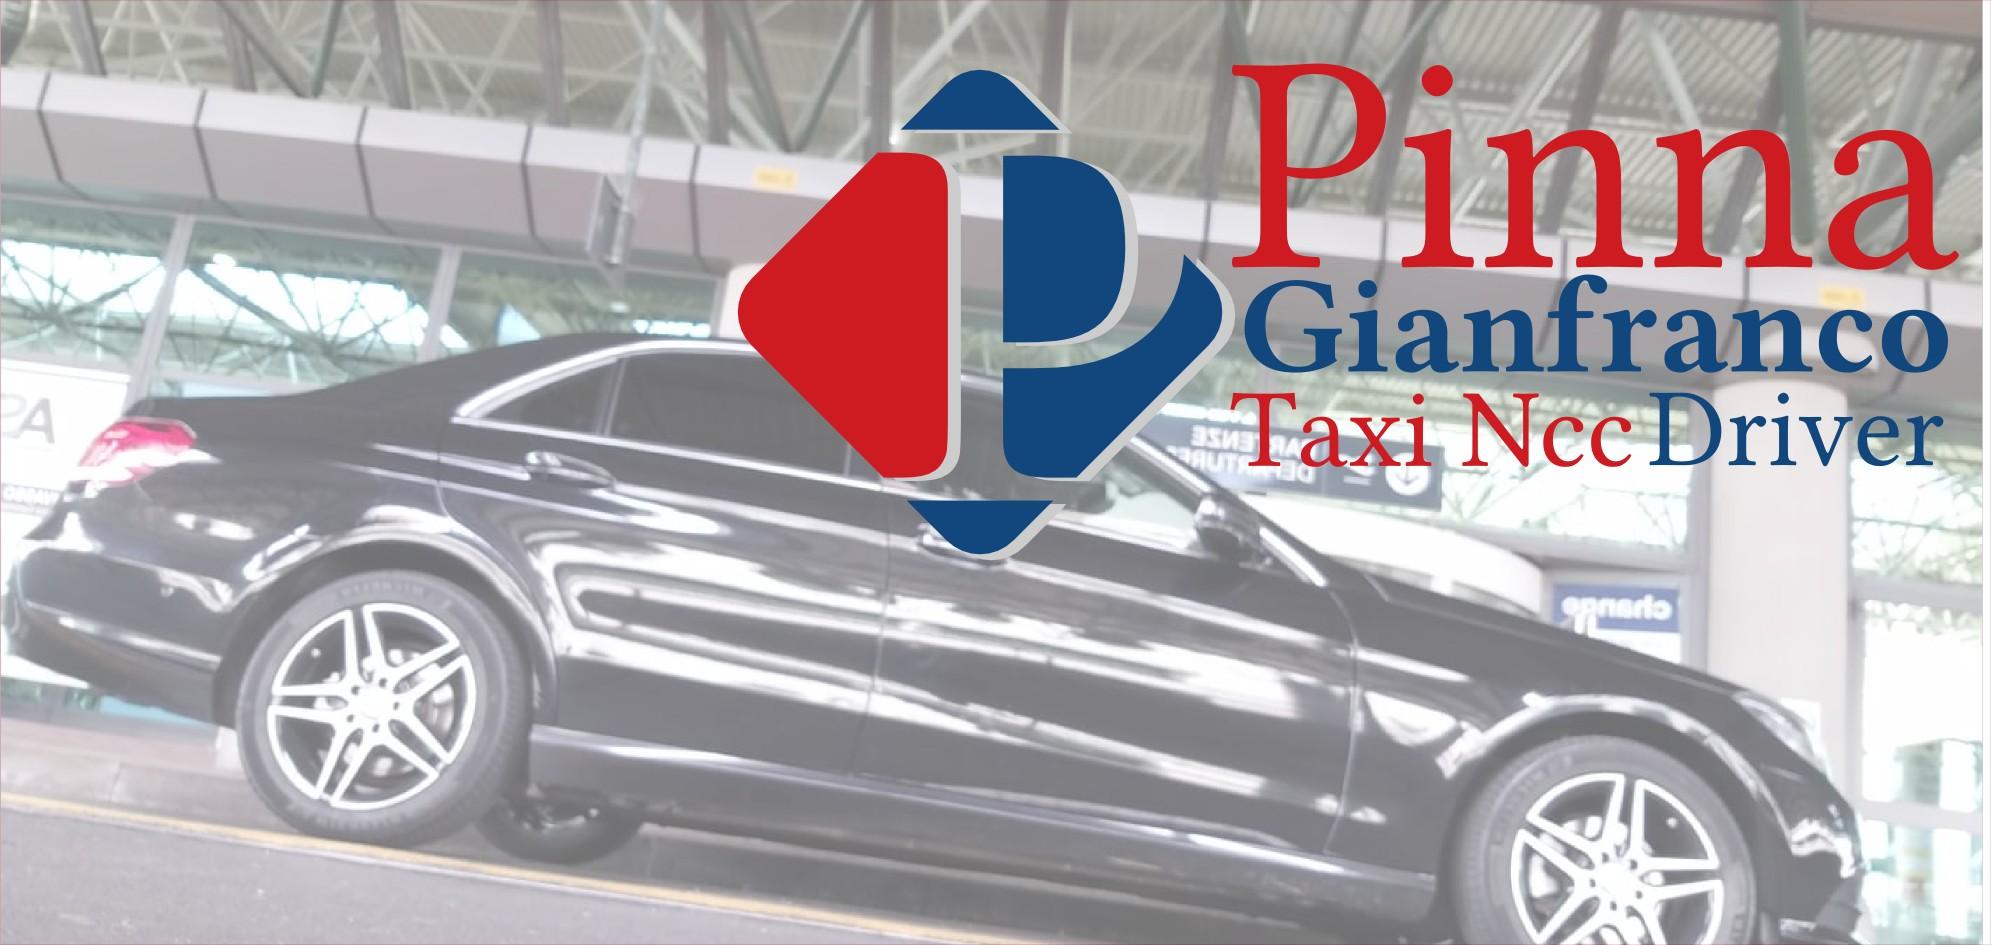 Taxi The Privacy – GianFranco PINNA